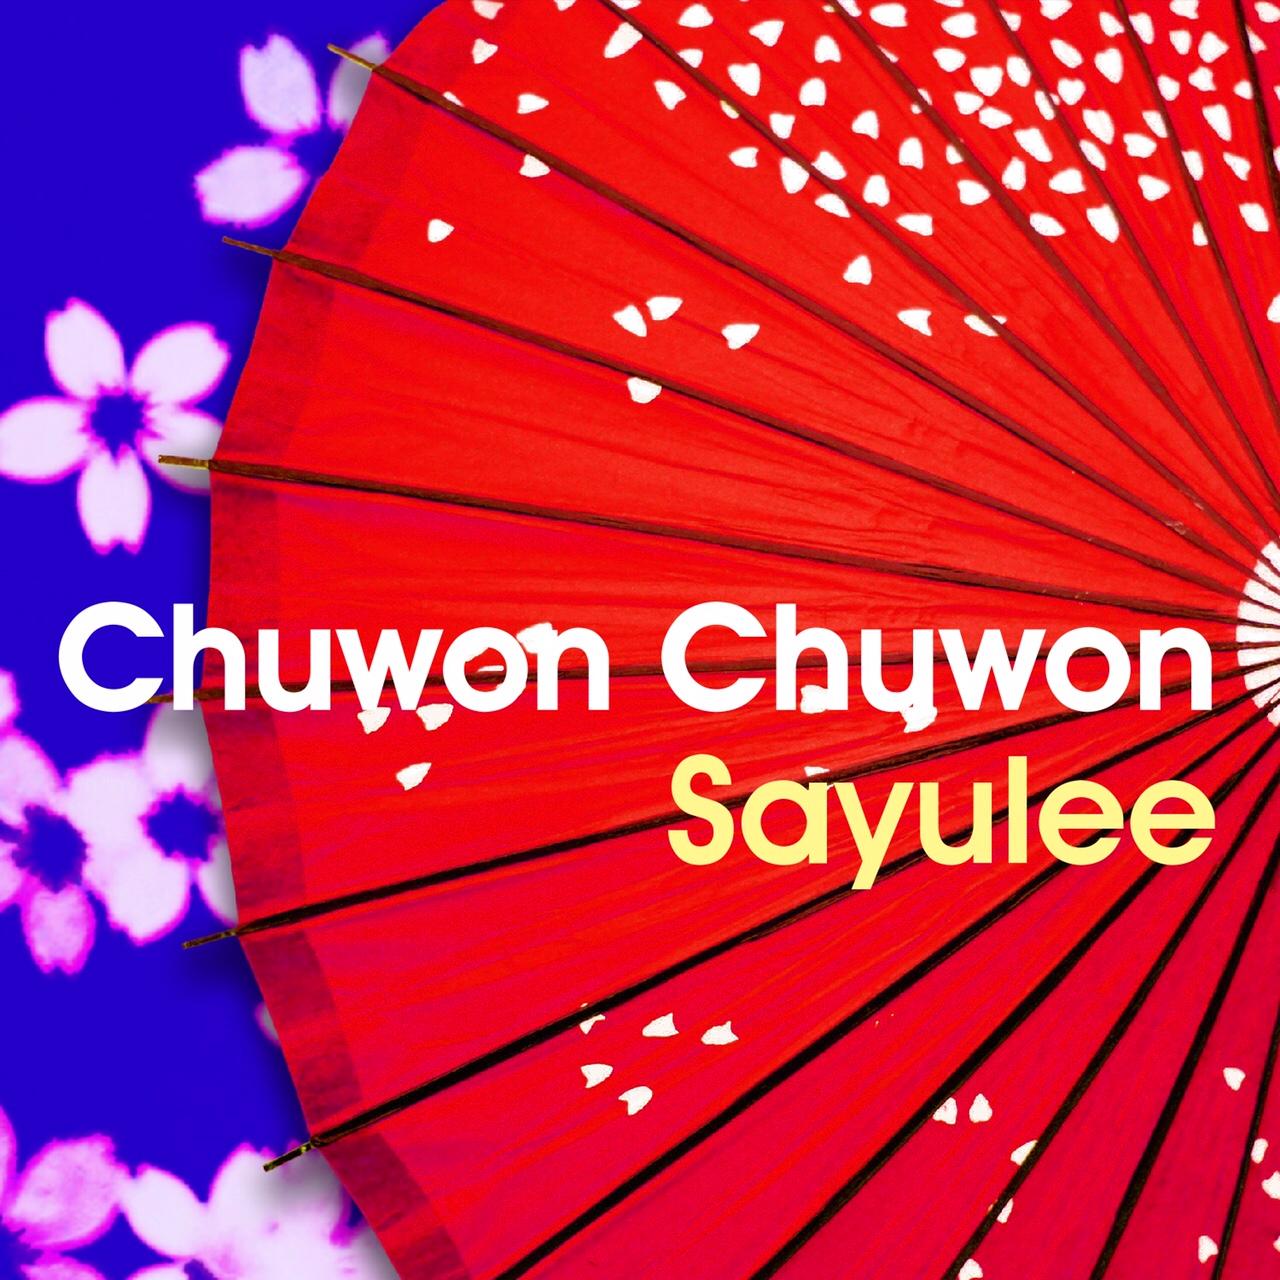 Chuwon Chuwon on iTunes NOW